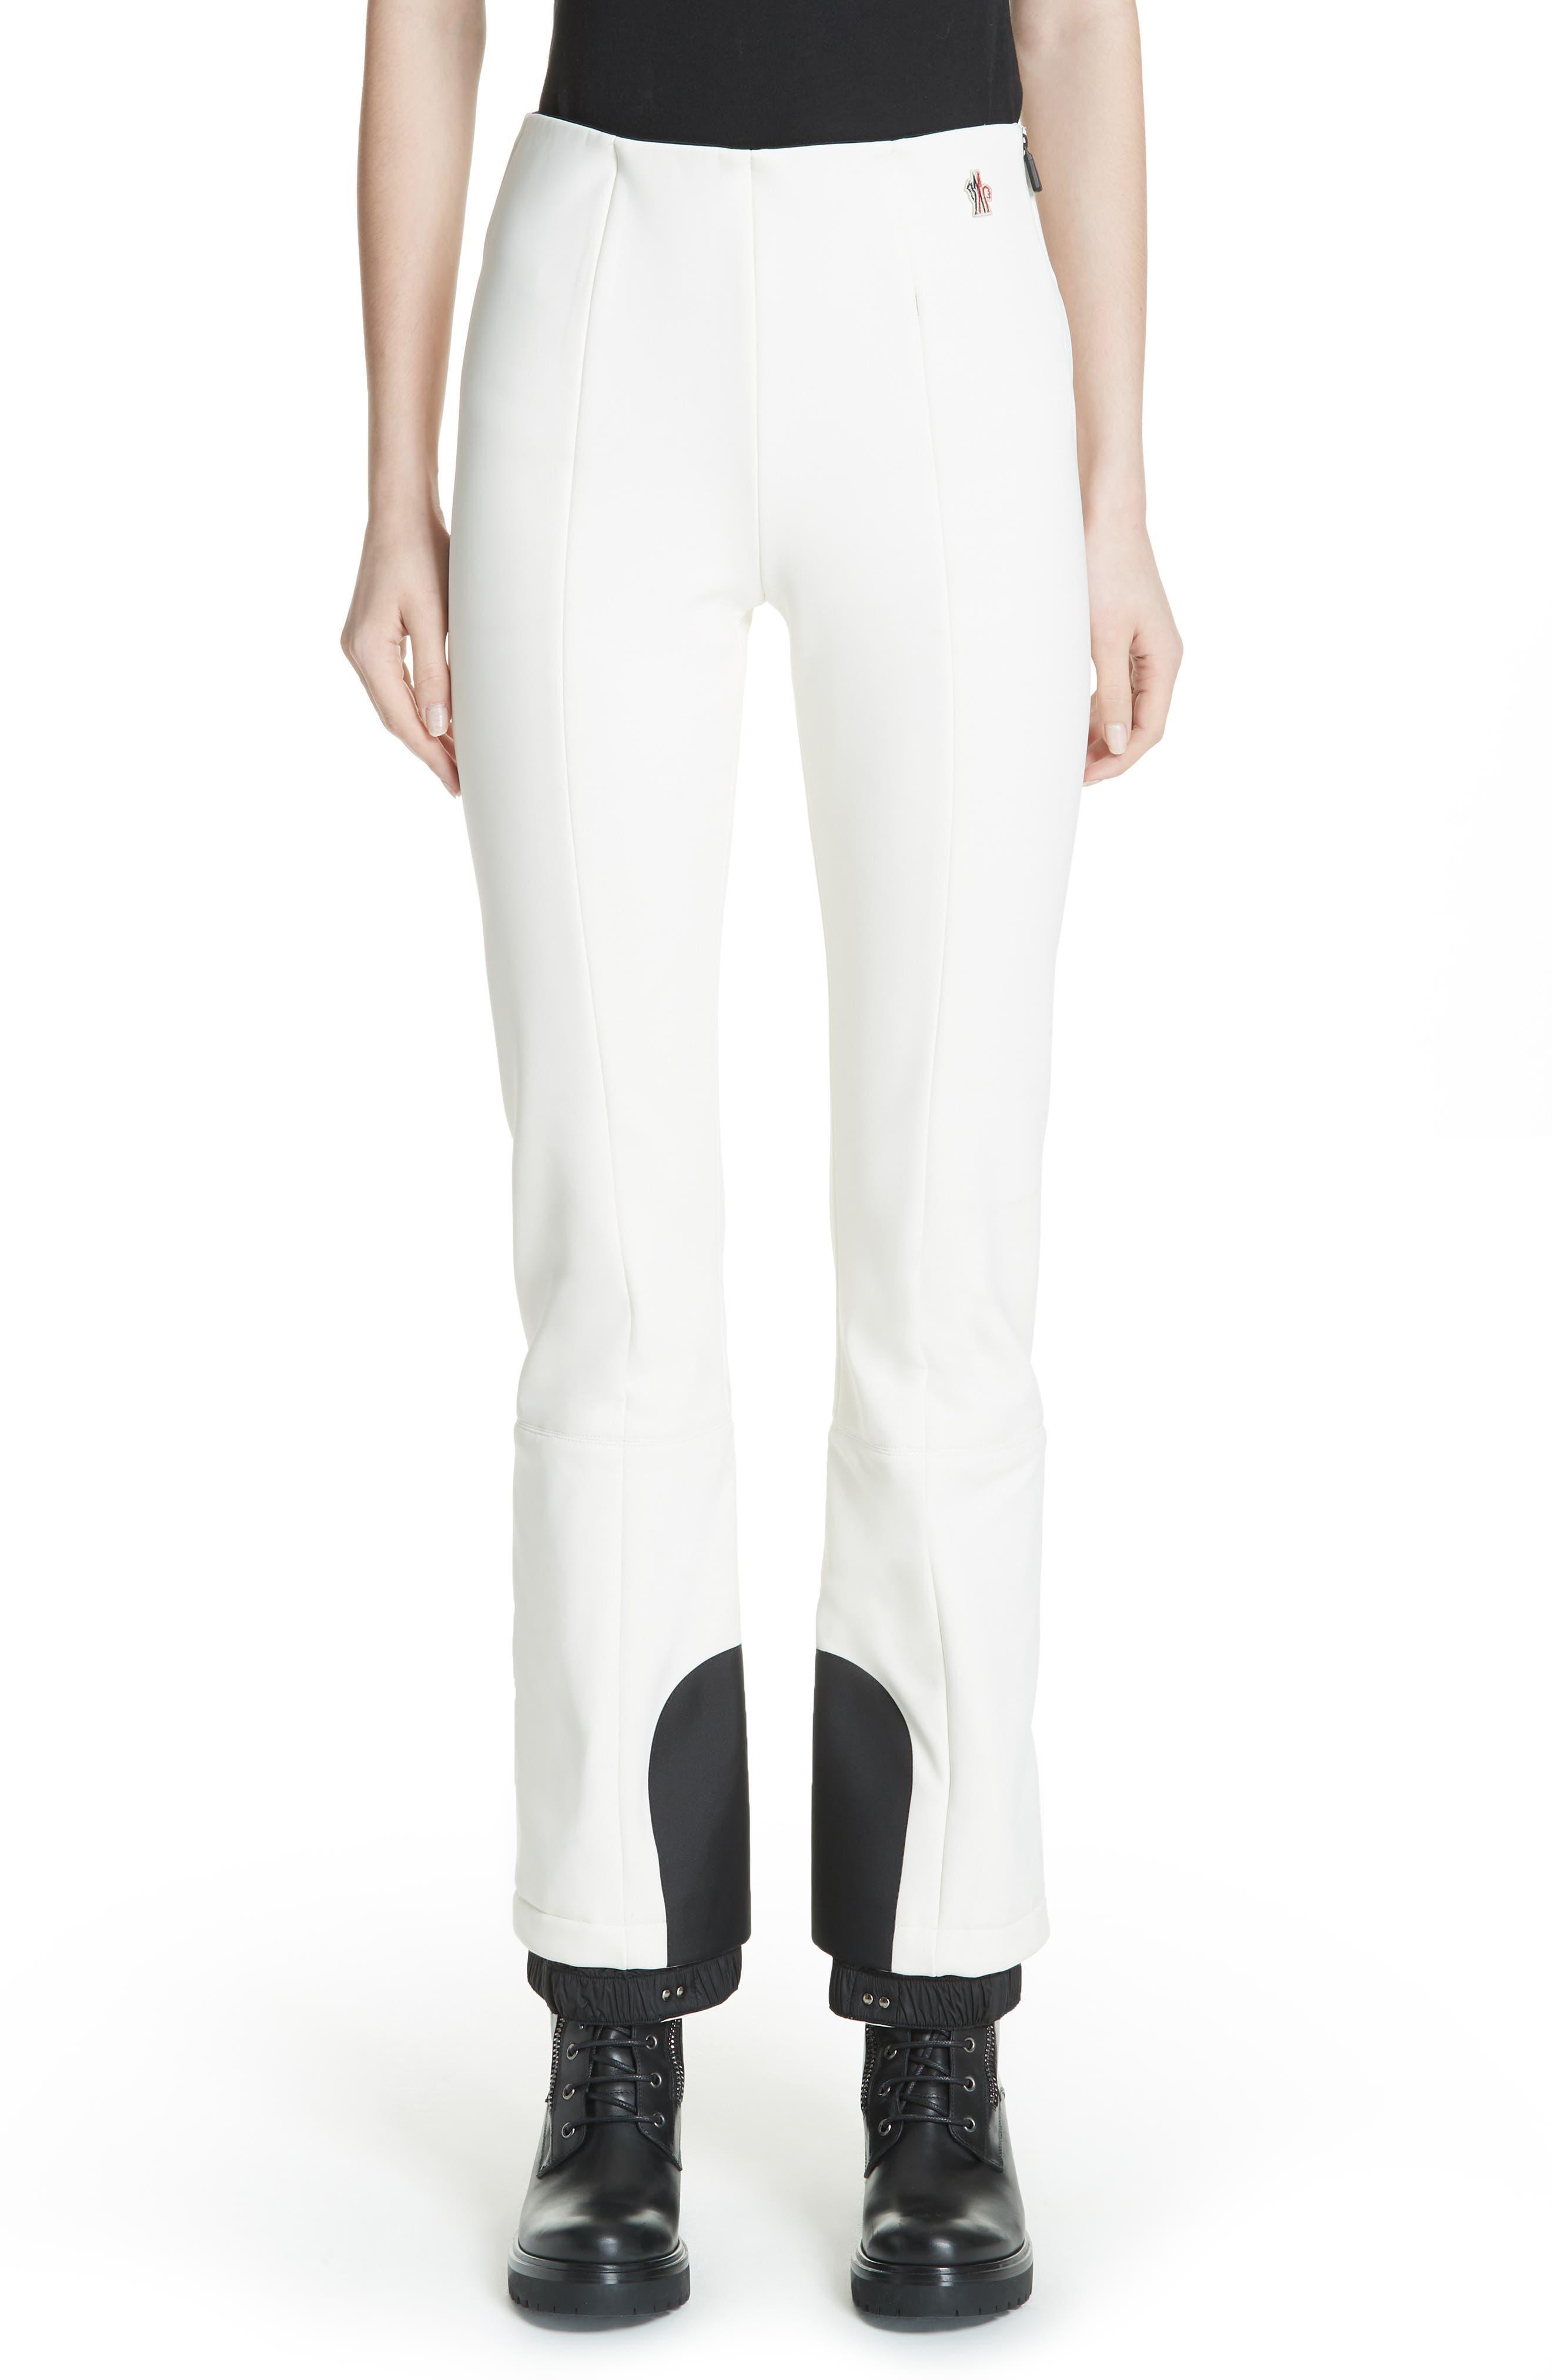 MONCLER, Skinny Stretch Ski Pants, Main thumbnail 1, color, WHITE